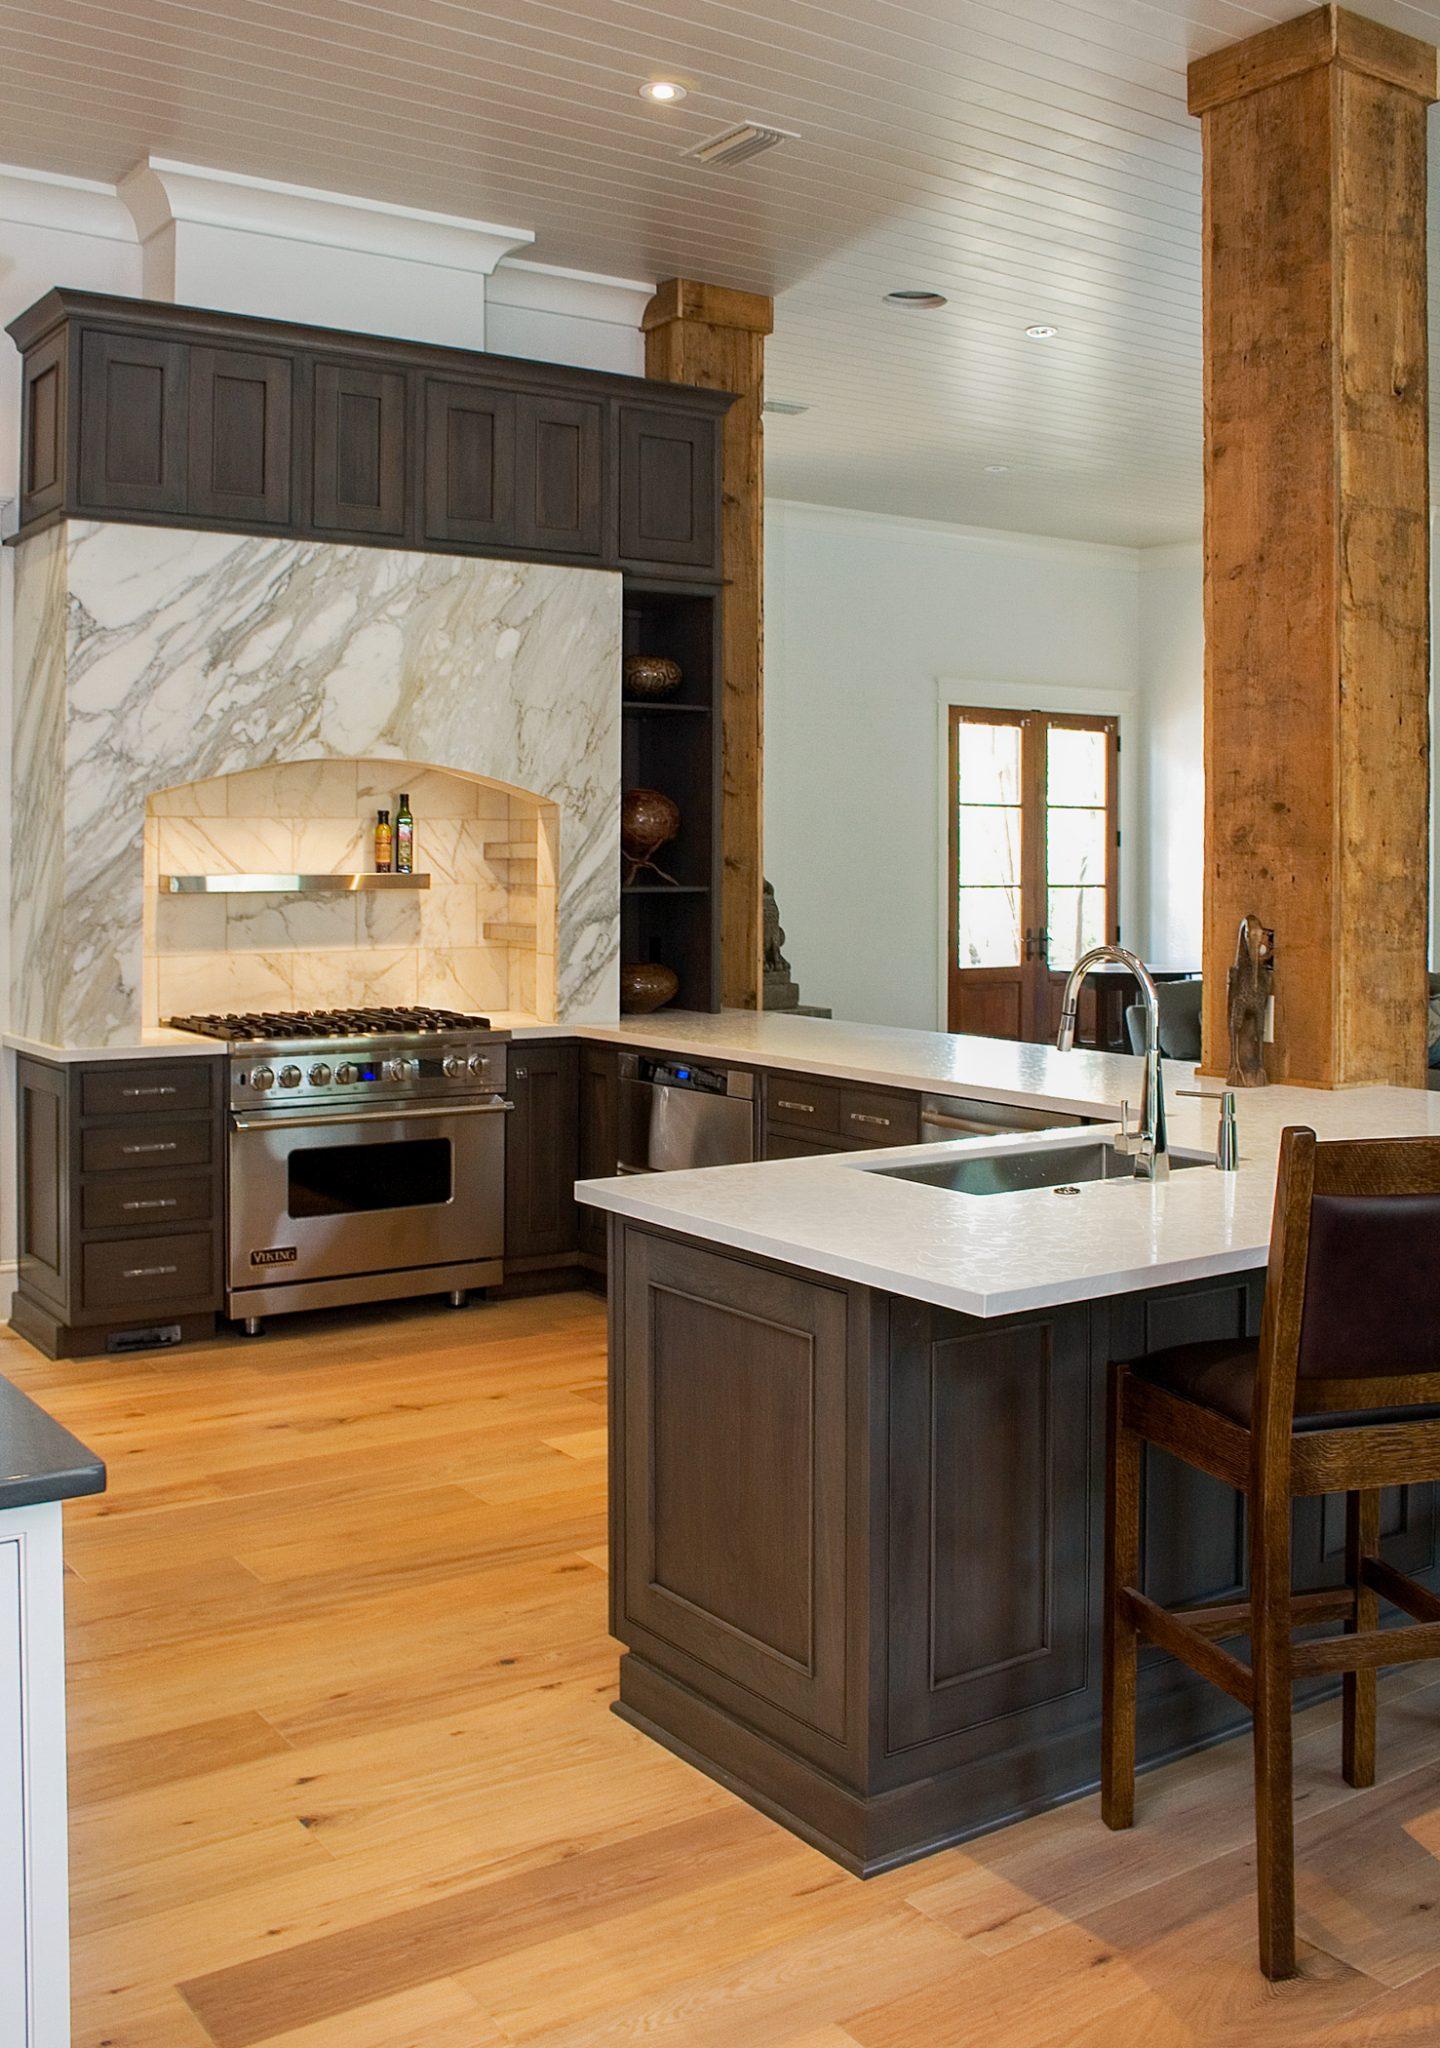 Kitchens Etc Gallery